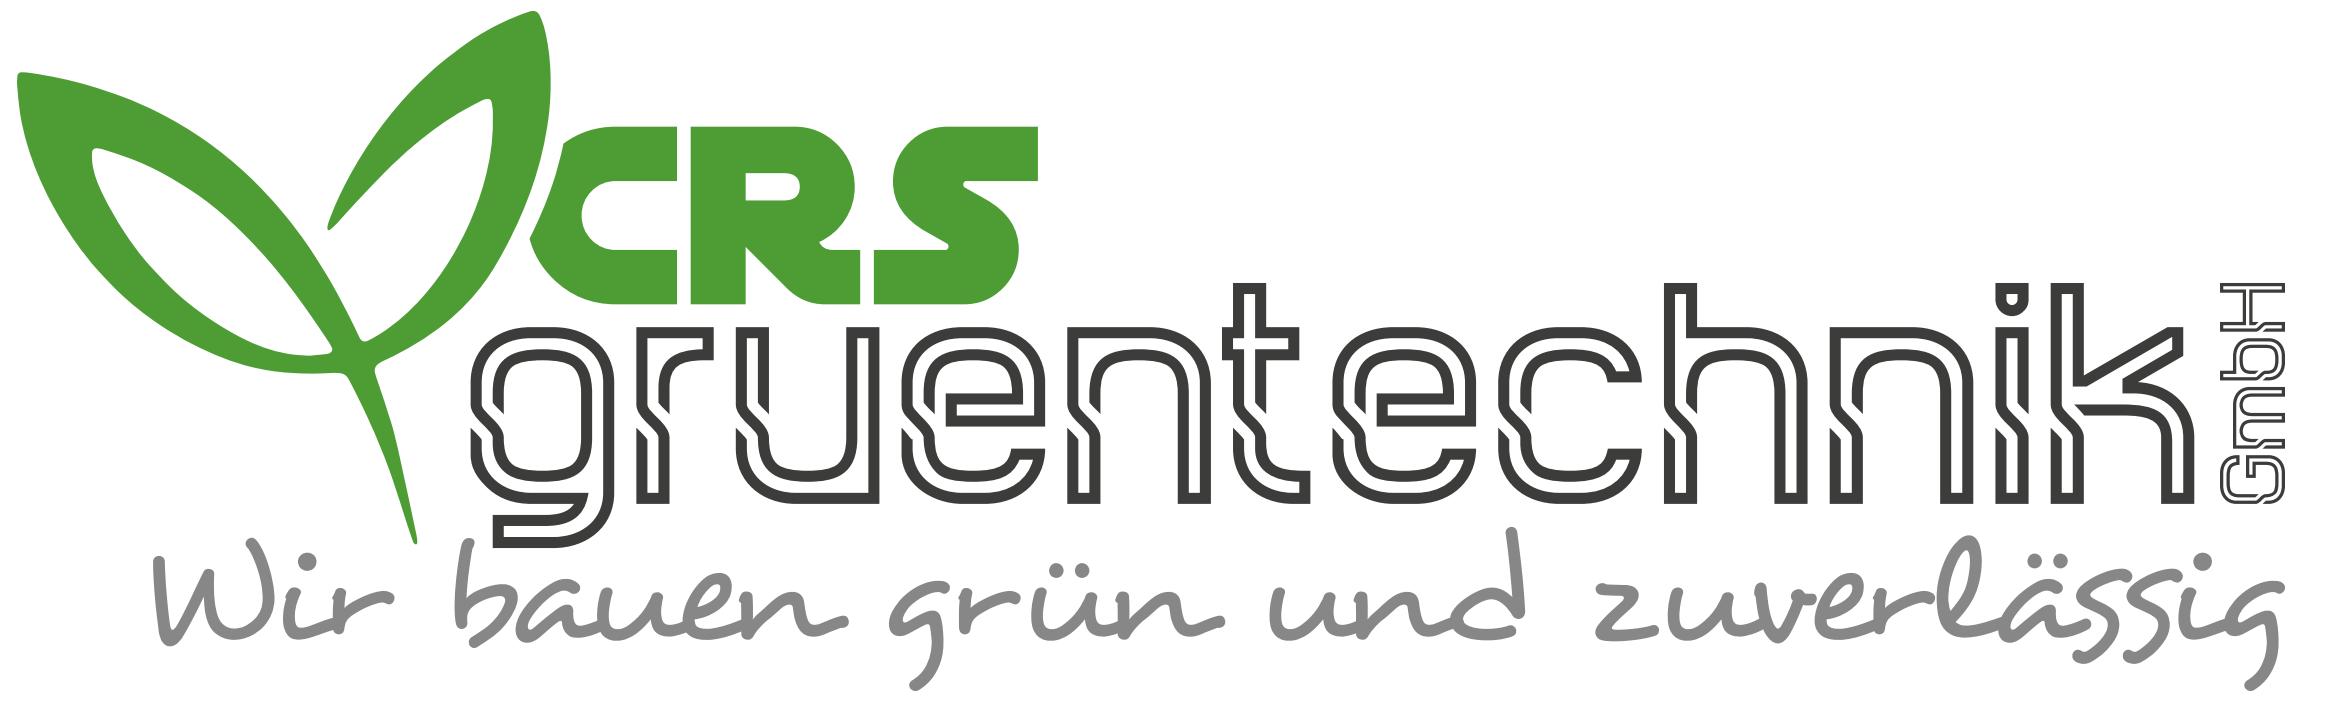 CRS gruentechnik